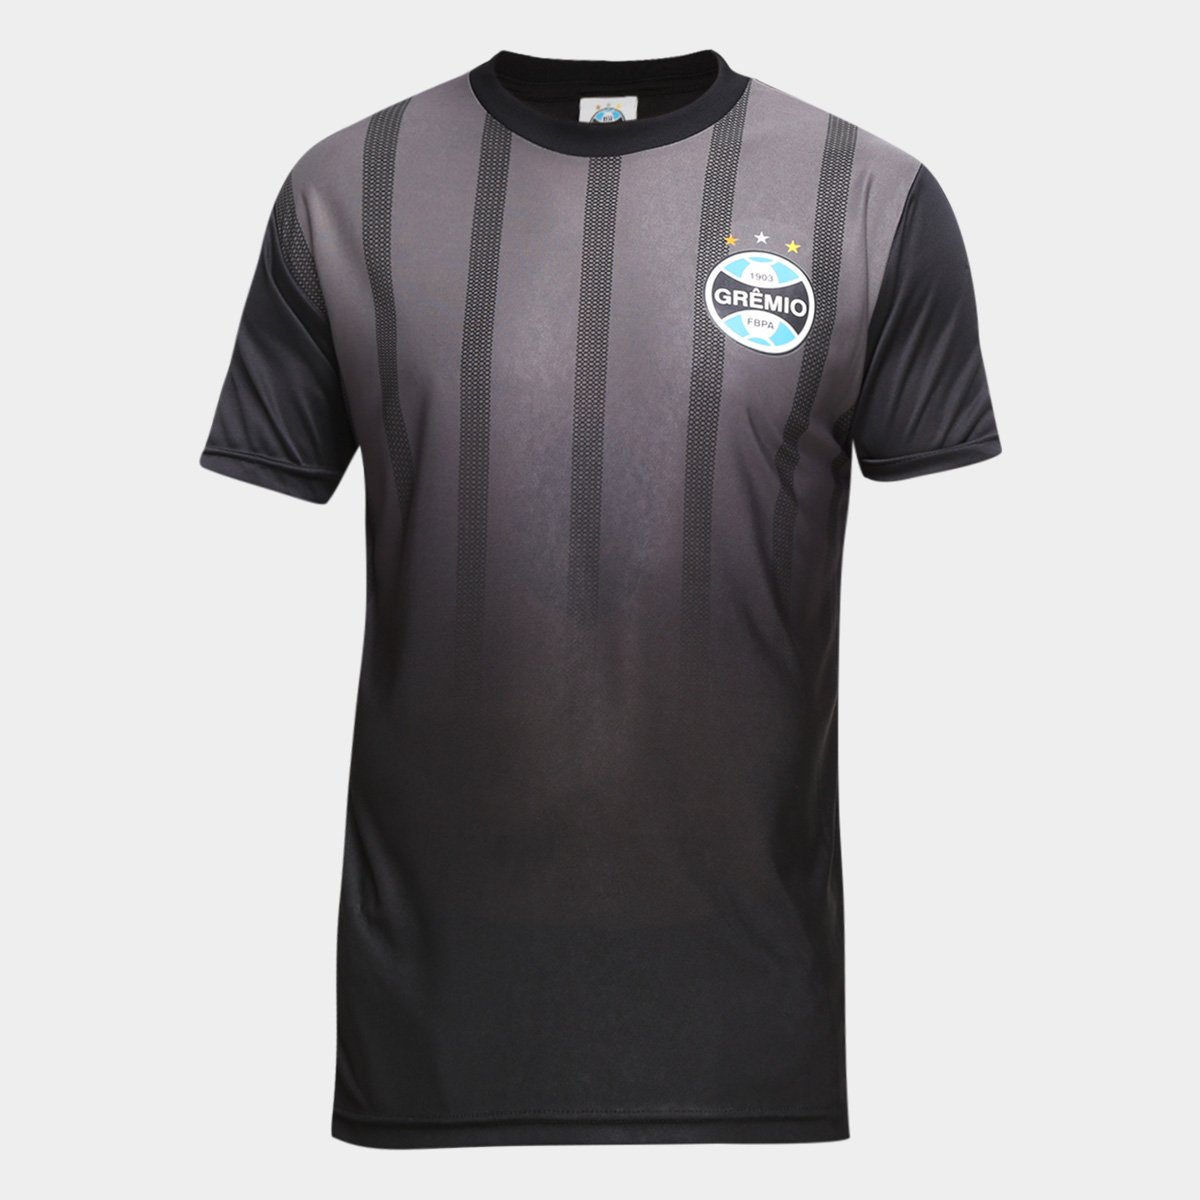 Camiseta Grêmio Dry Flag Masculina - Preta